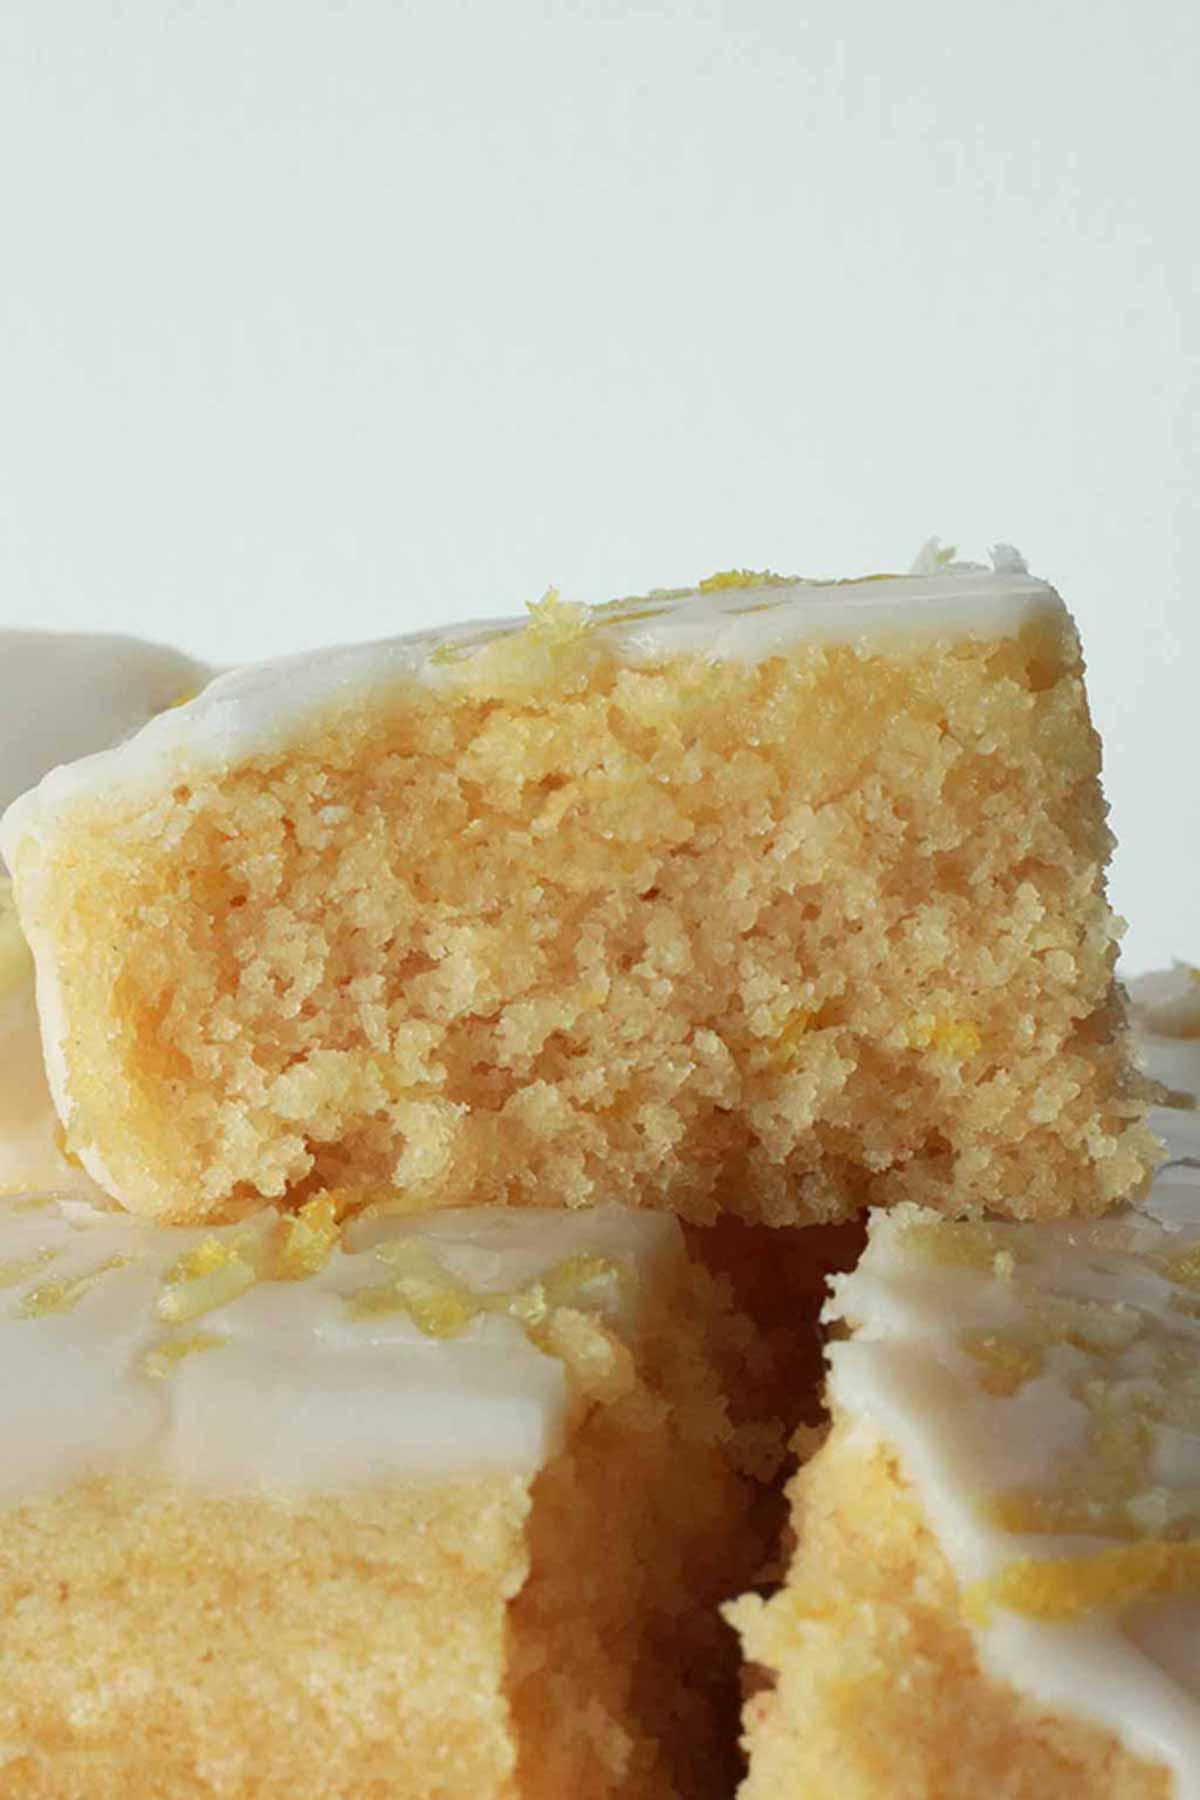 Square Slices Of Lemon Drizzle Cake